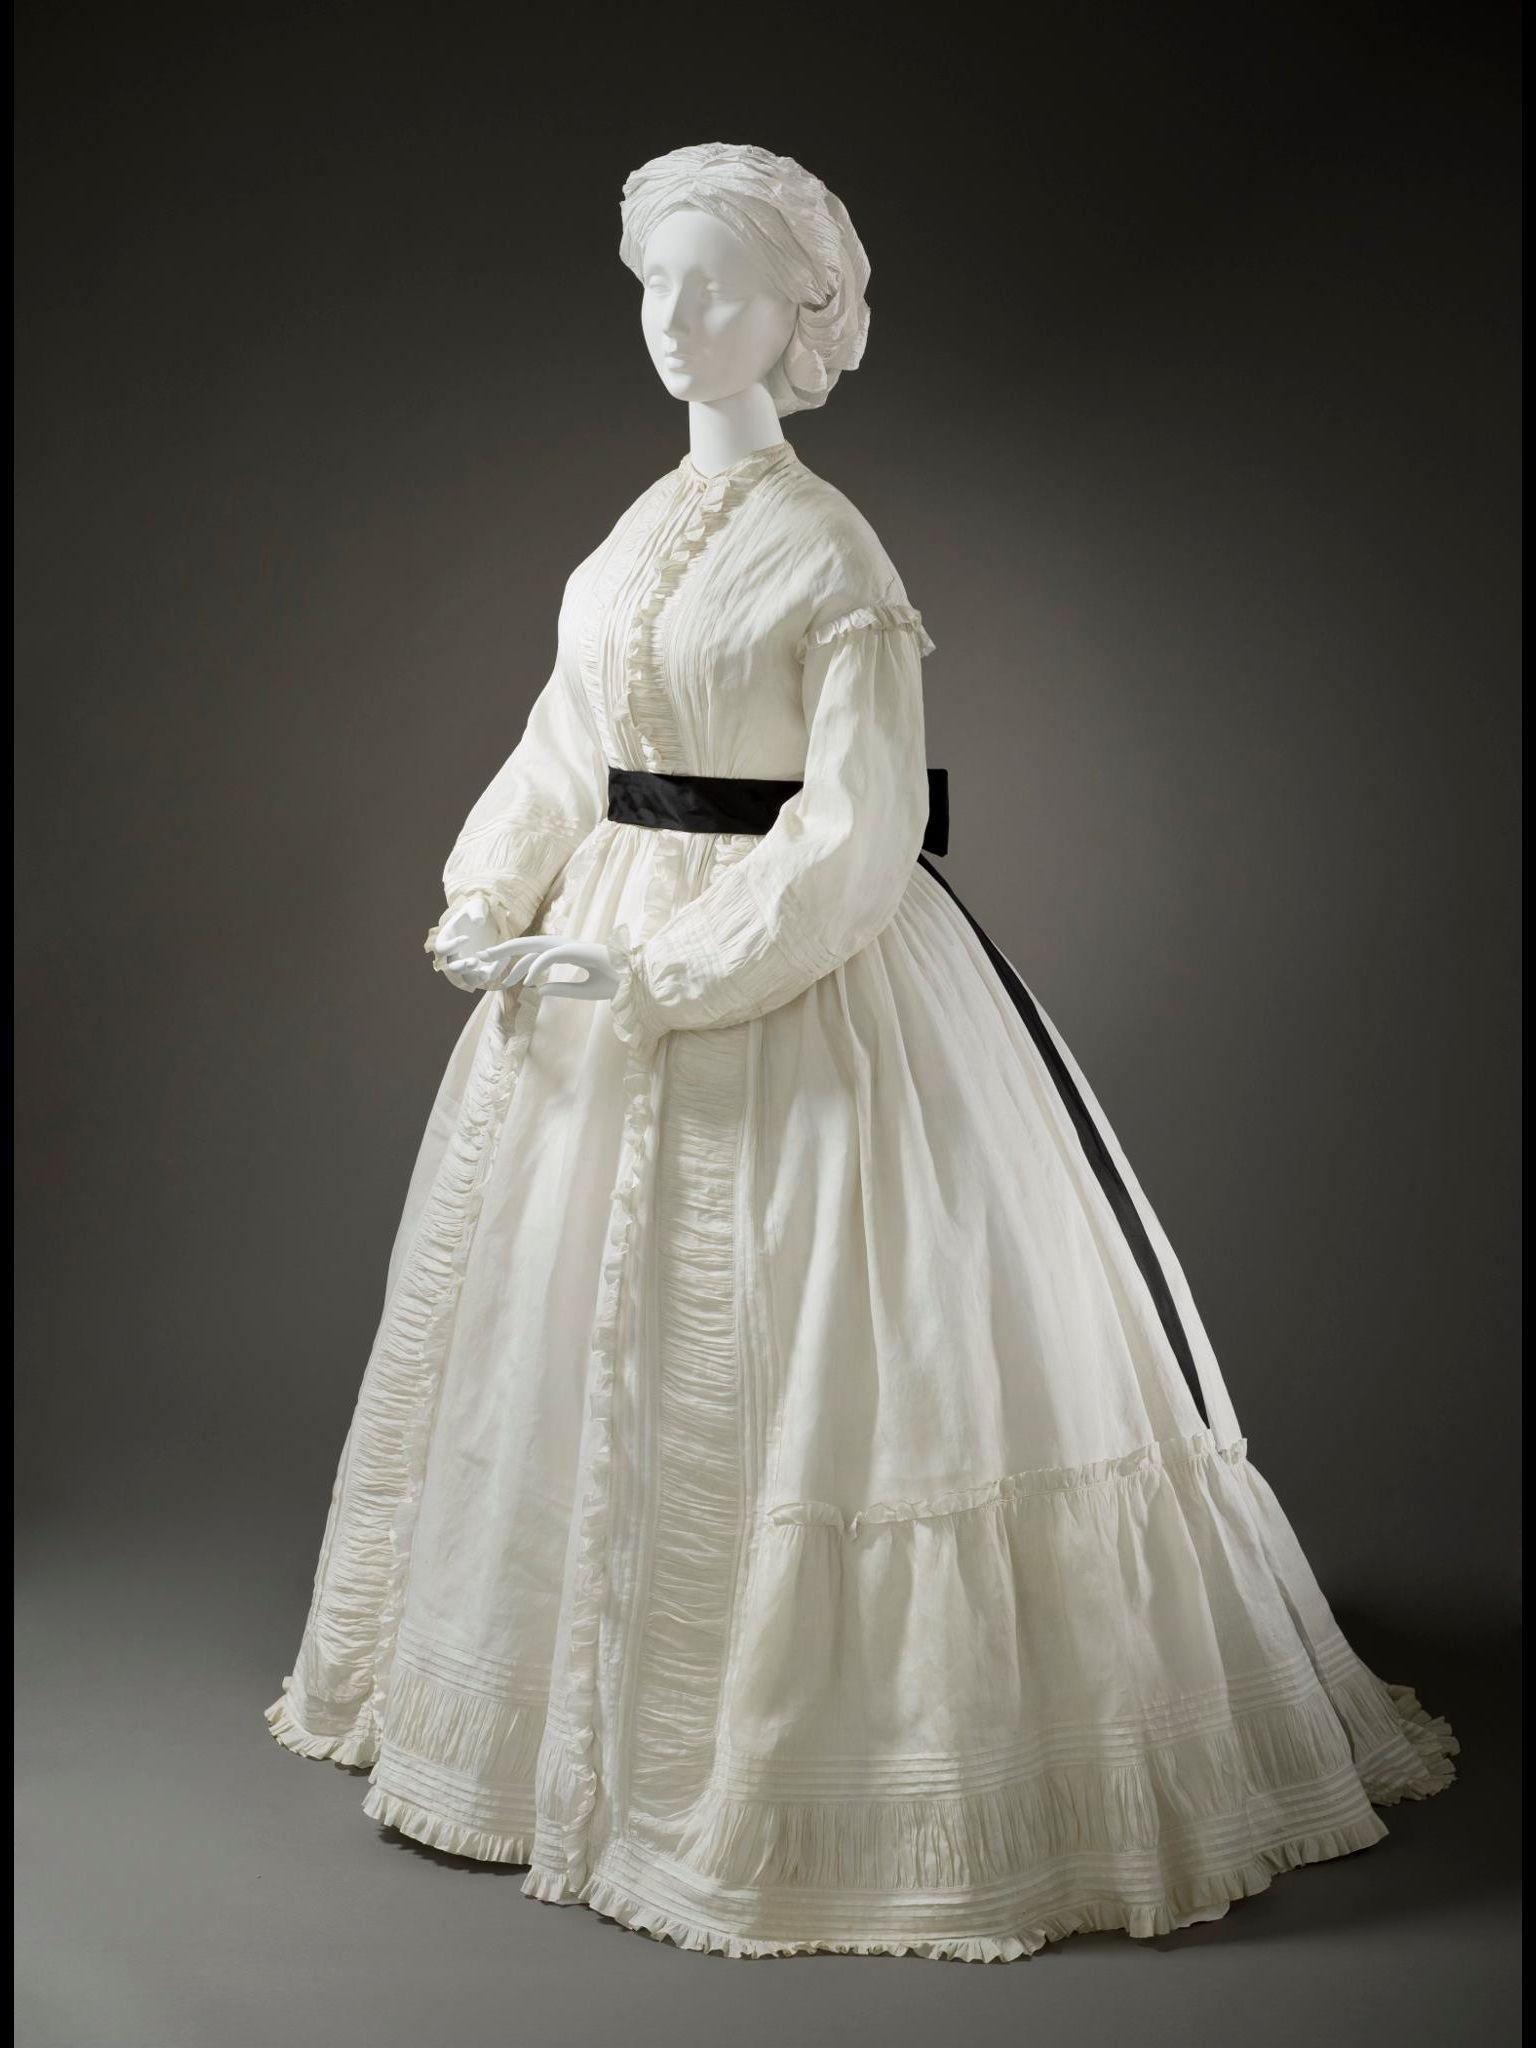 Summer Dress Historical Dresses Morning Dress Dresses [ 2048 x 1536 Pixel ]